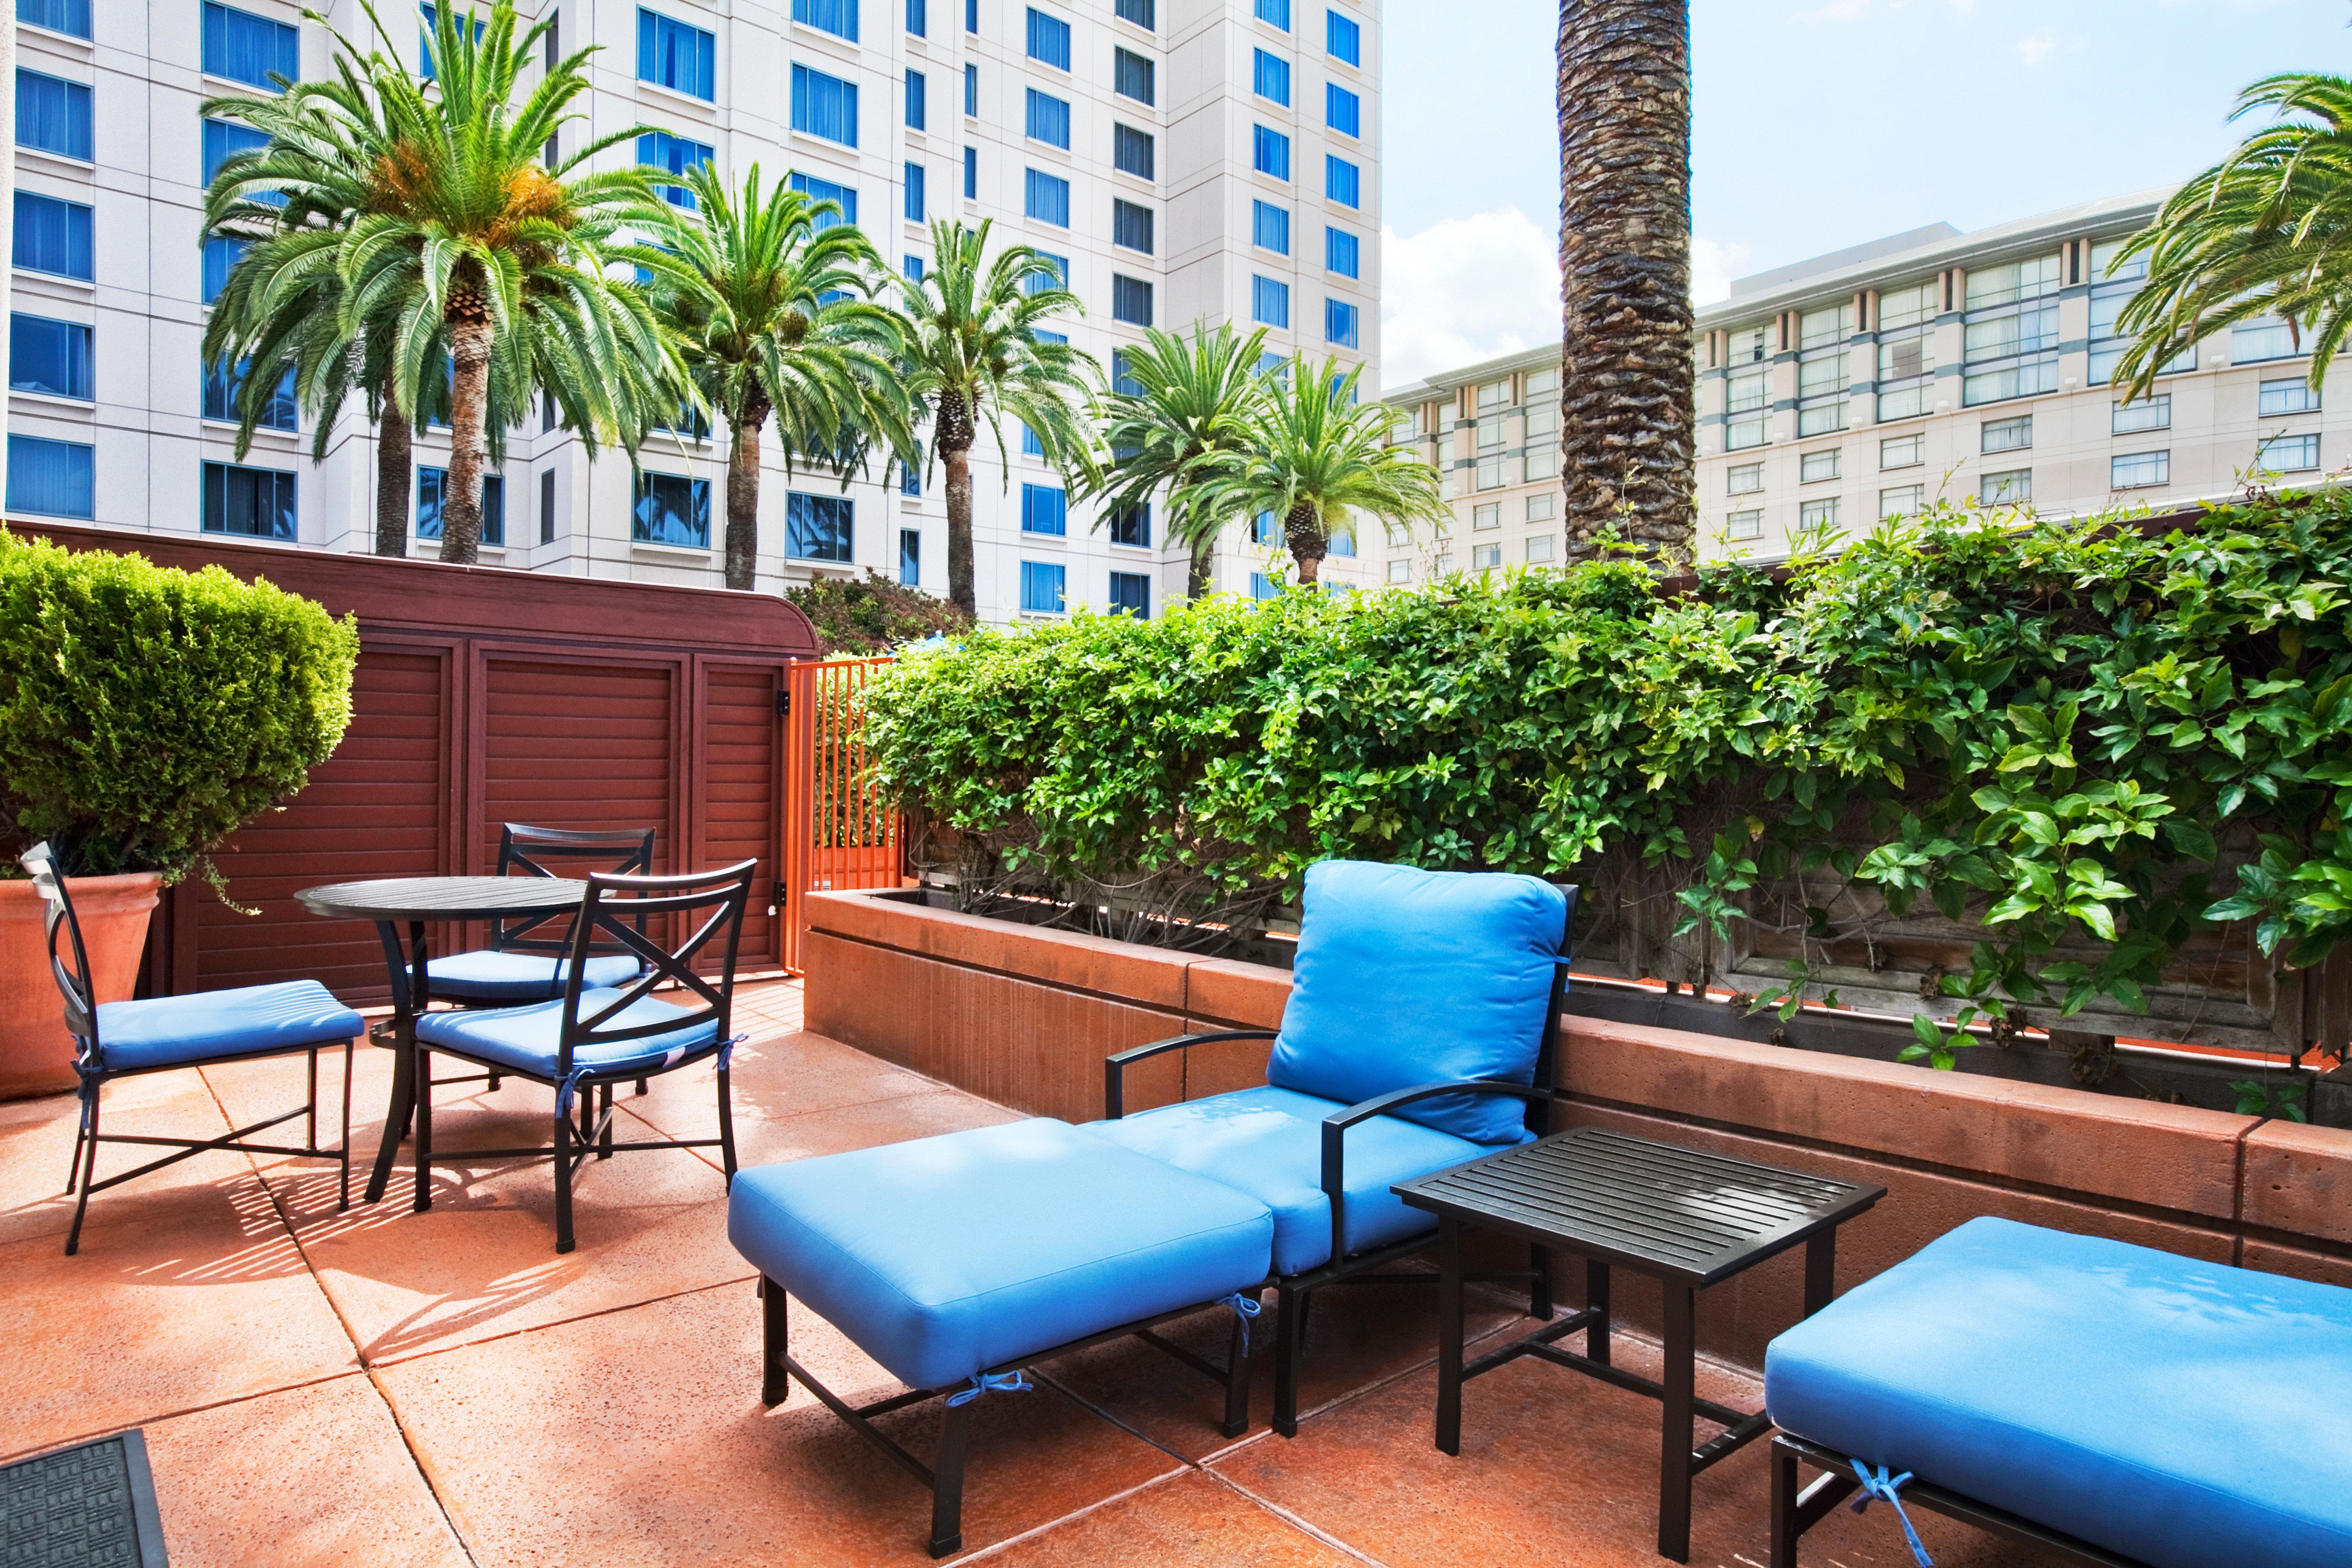 Lounge Outdoors Patio Terrace chair condominium leisure property building Resort swimming pool plant Villa home Courtyard plaza blue backyard restaurant Garden